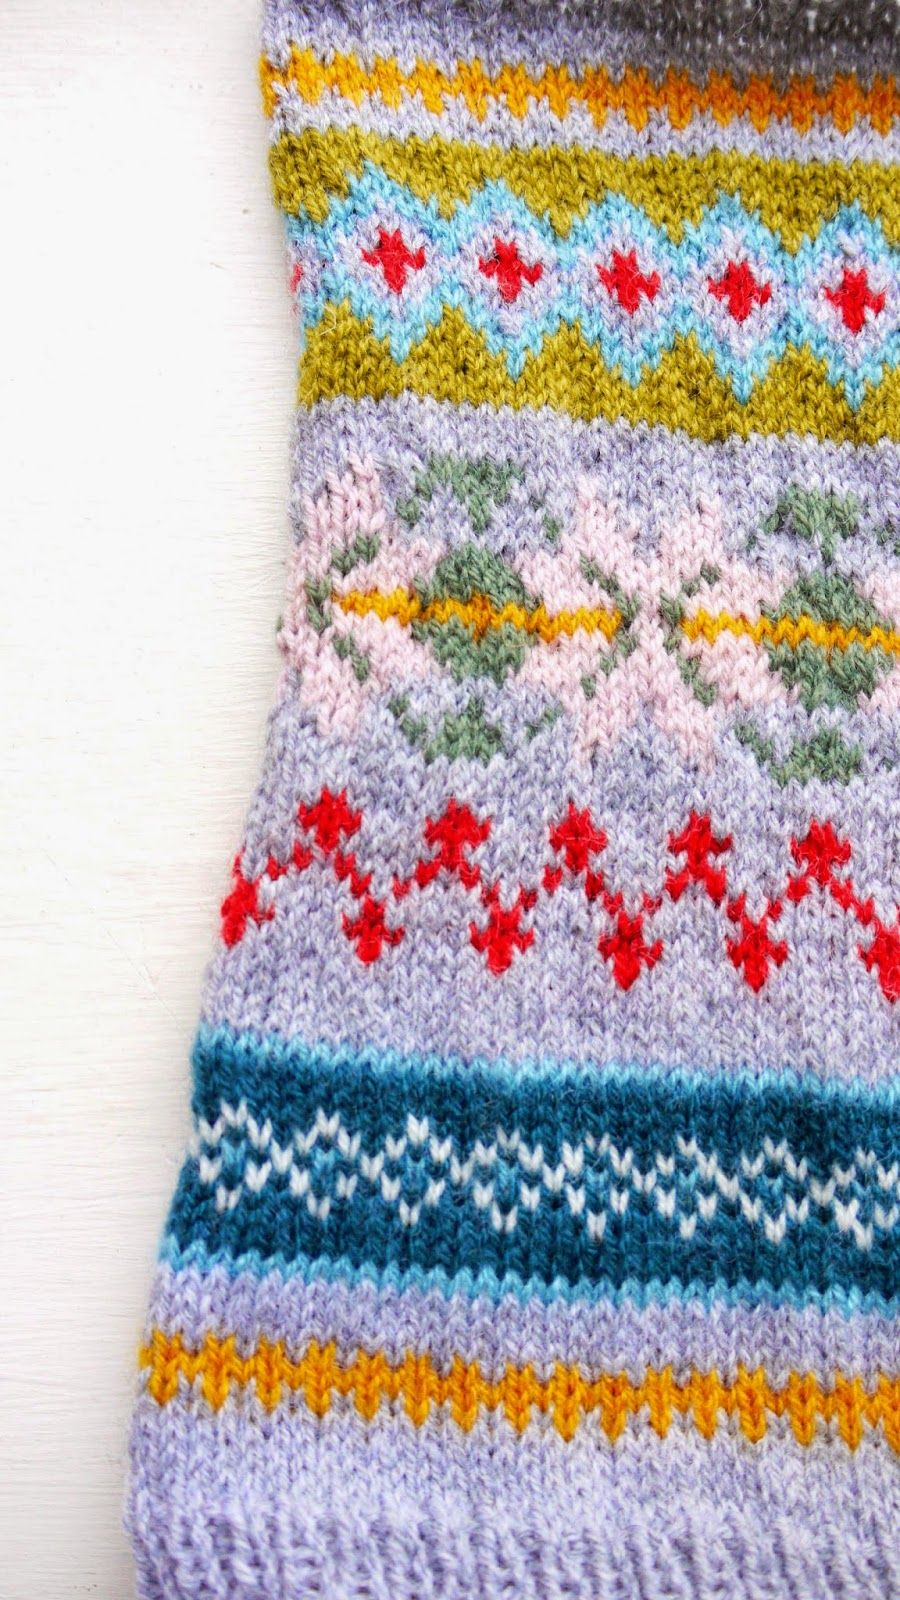 Porcupine Design - fair isle neck warmer | Mo Station | Pinterest ...